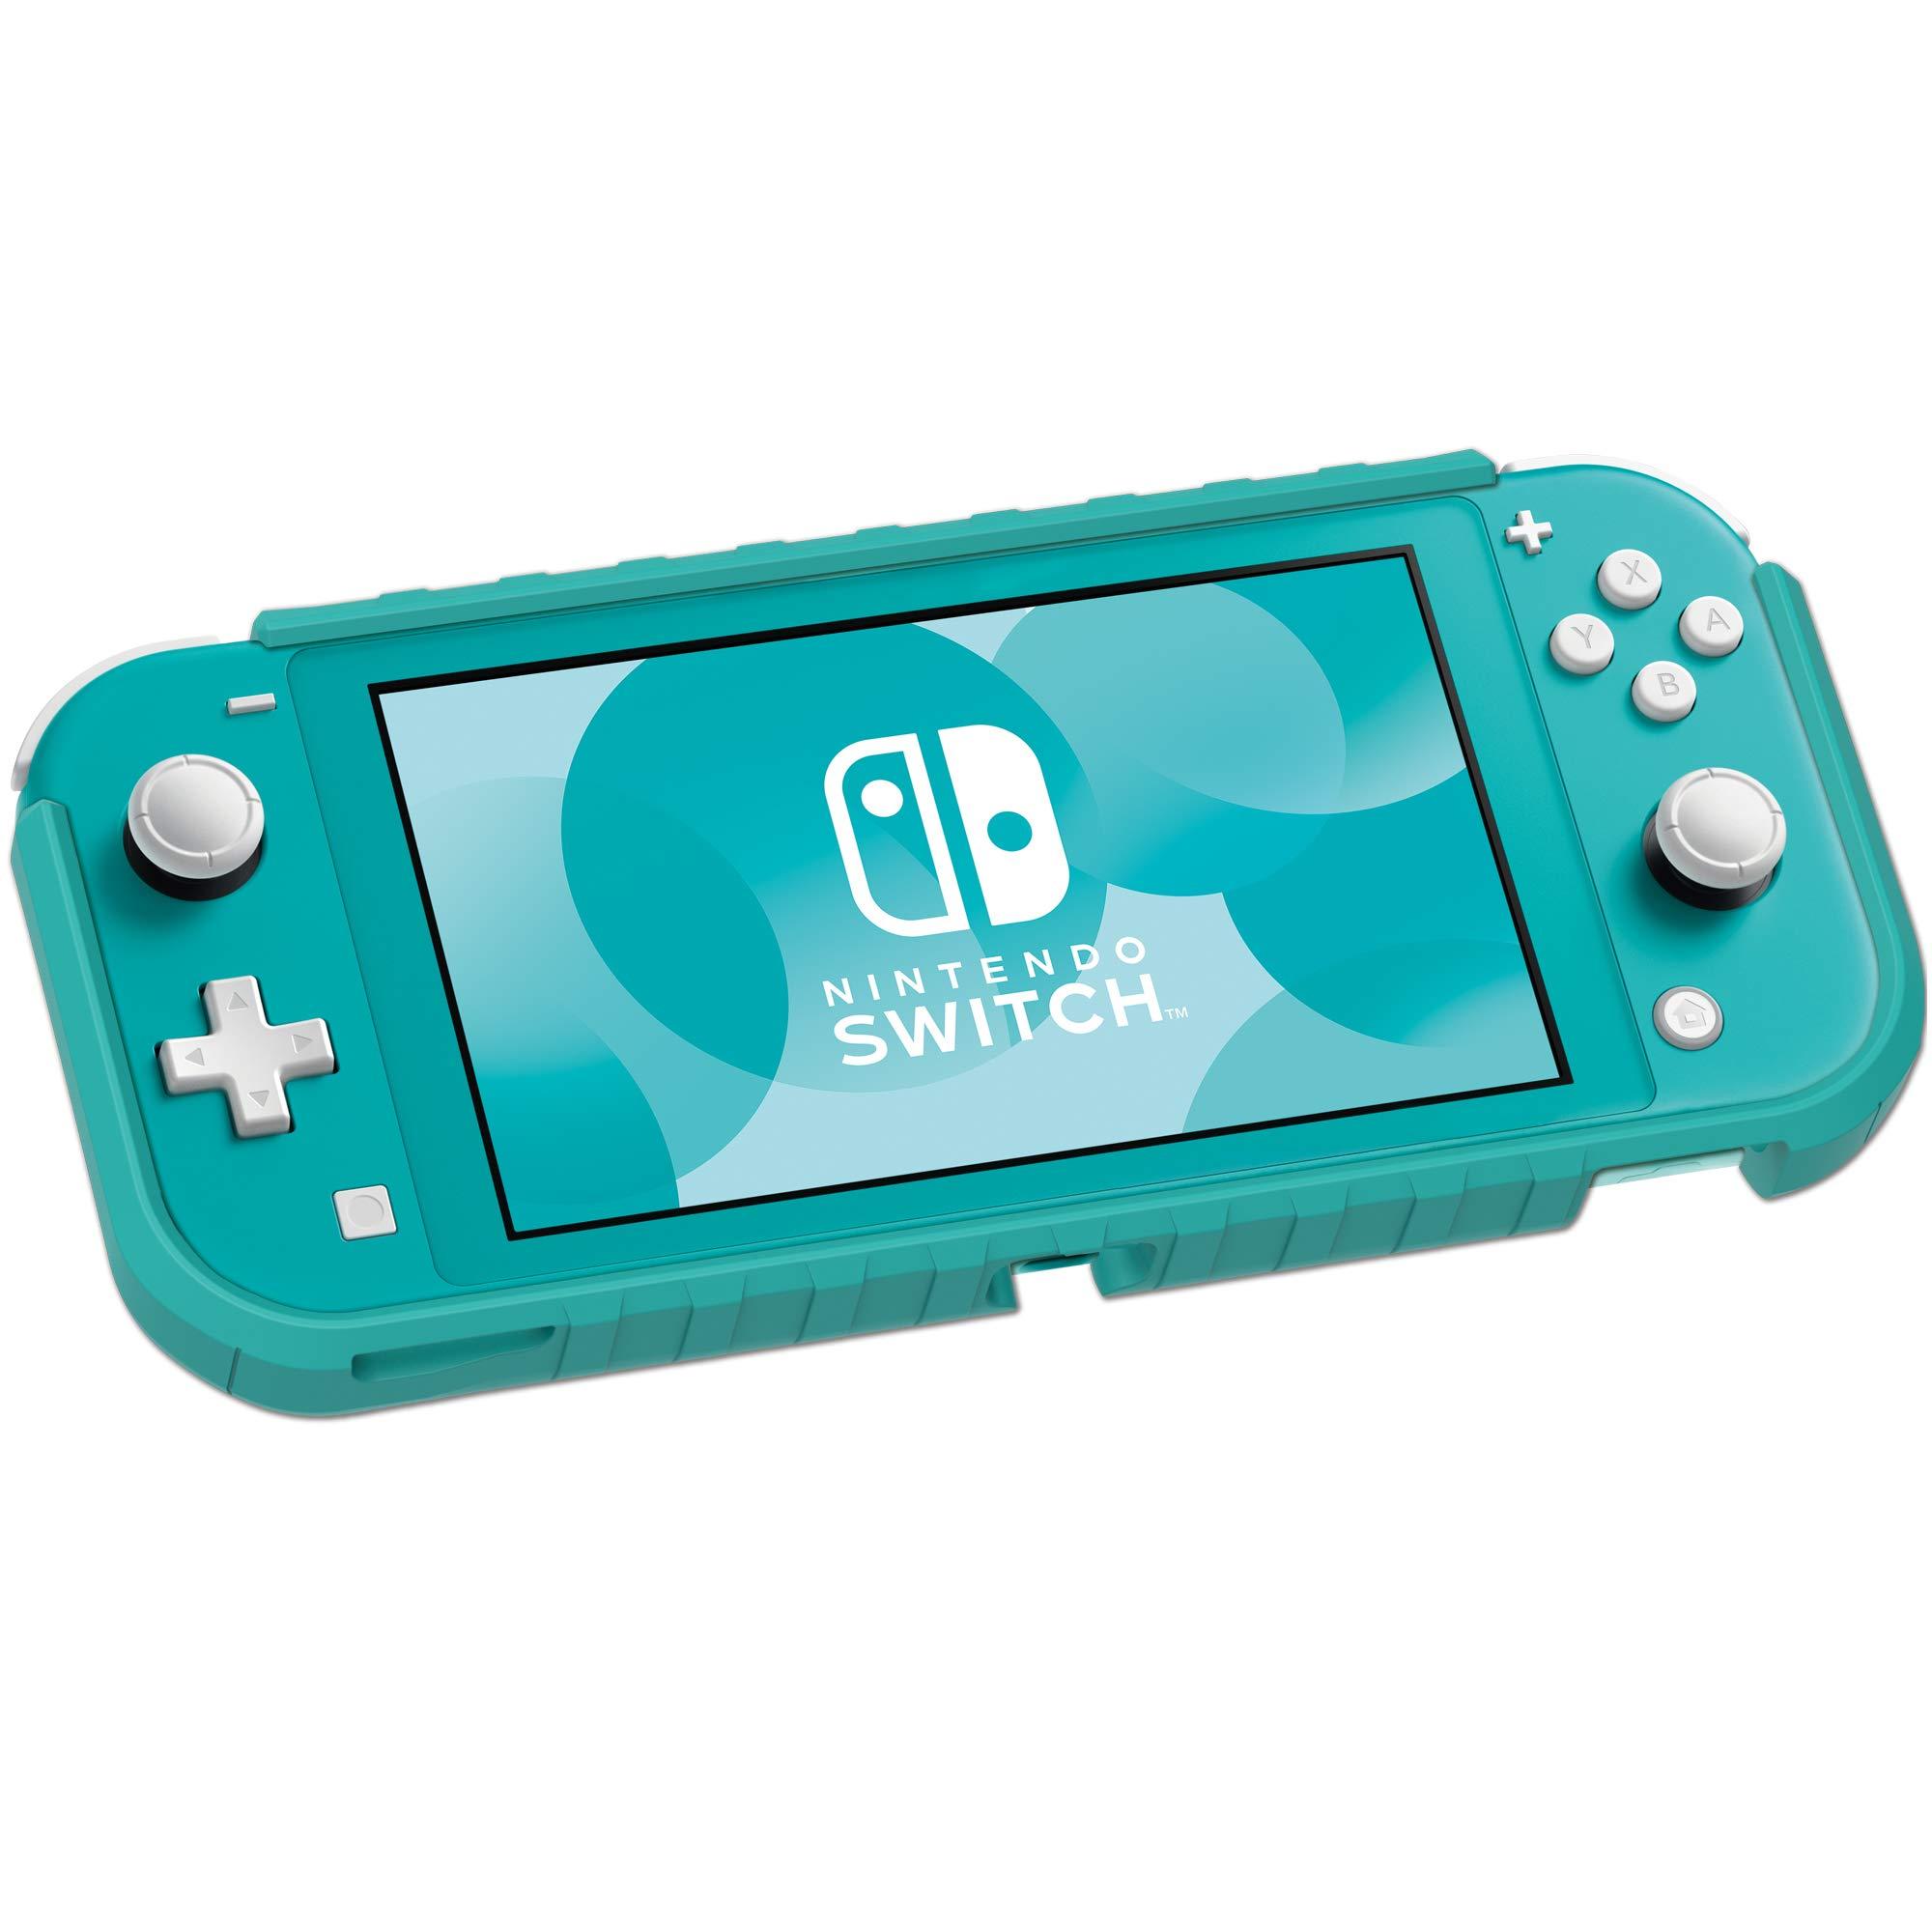 Hori - Carcasa híbrida turquesa (Nintendo Switch Lite): Amazon.es: Videojuegos